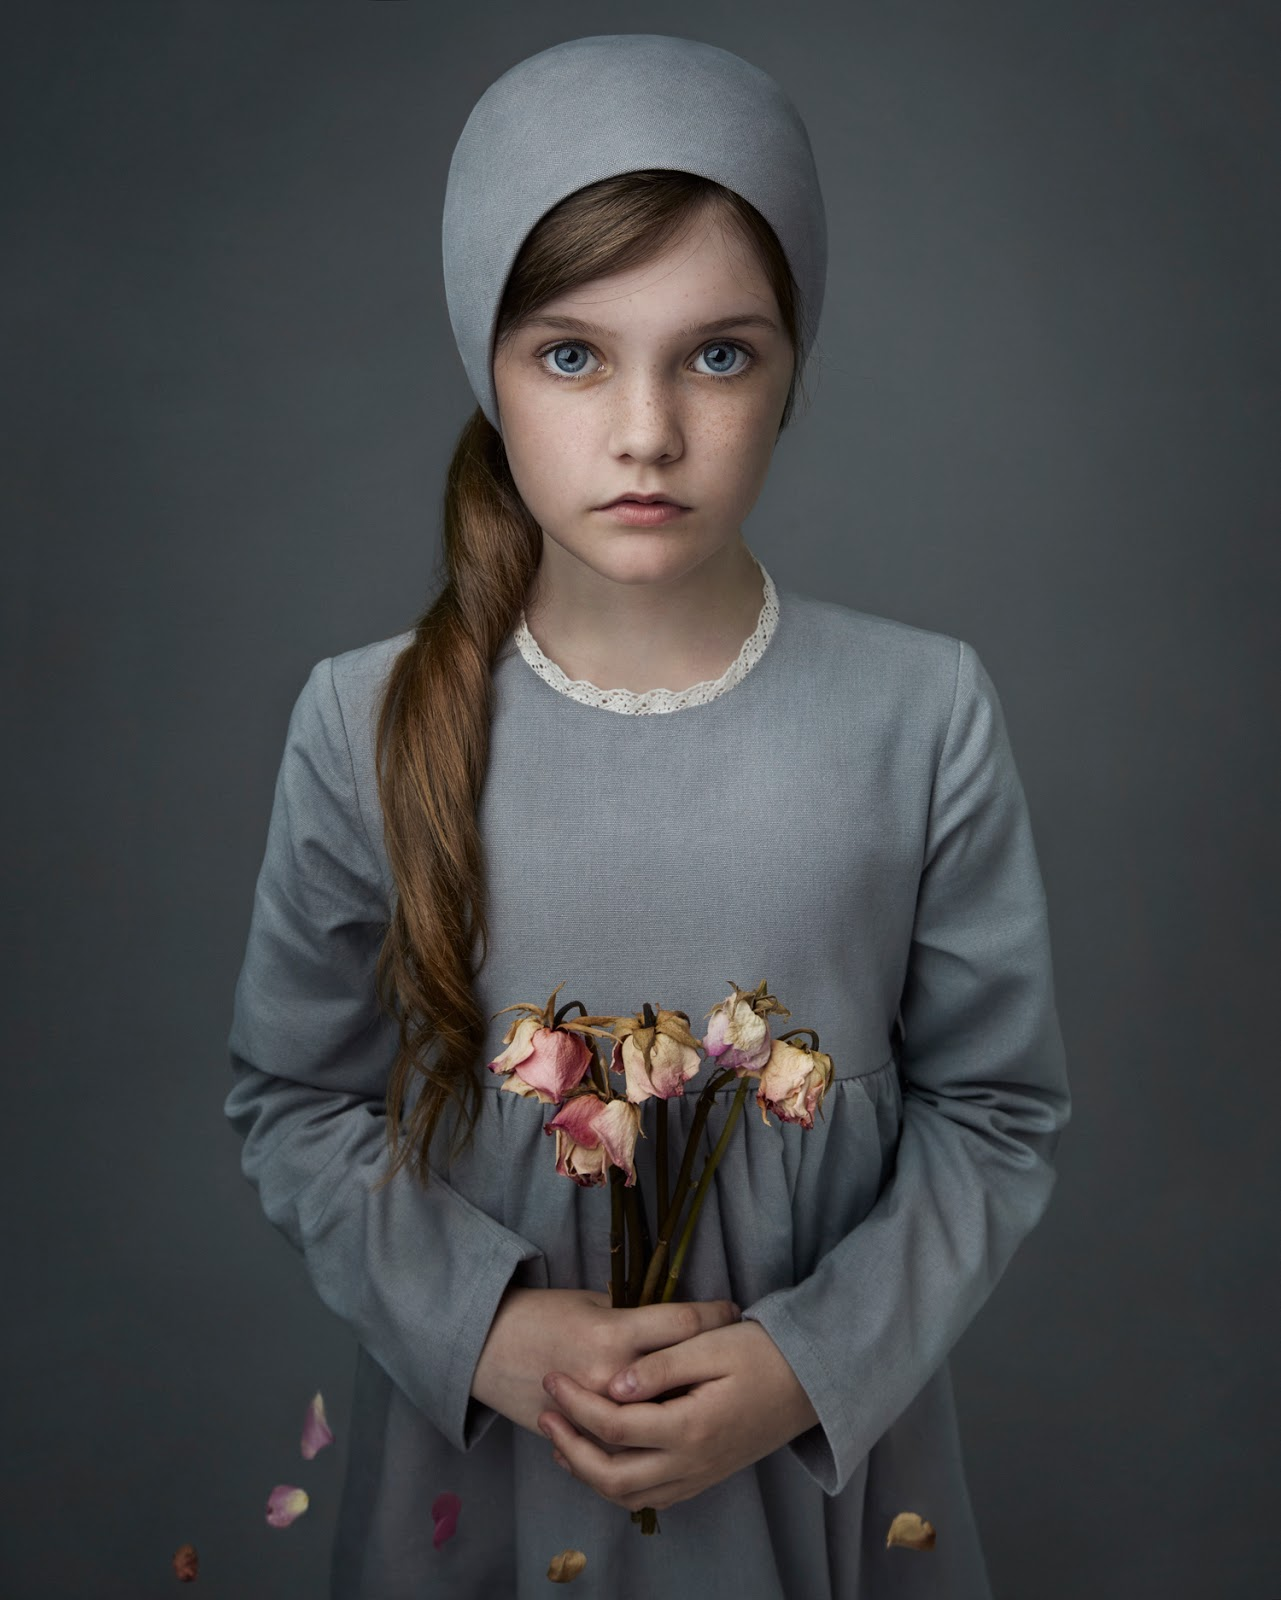 All my children photo shoot Cond Nast College of Fashion Design, London